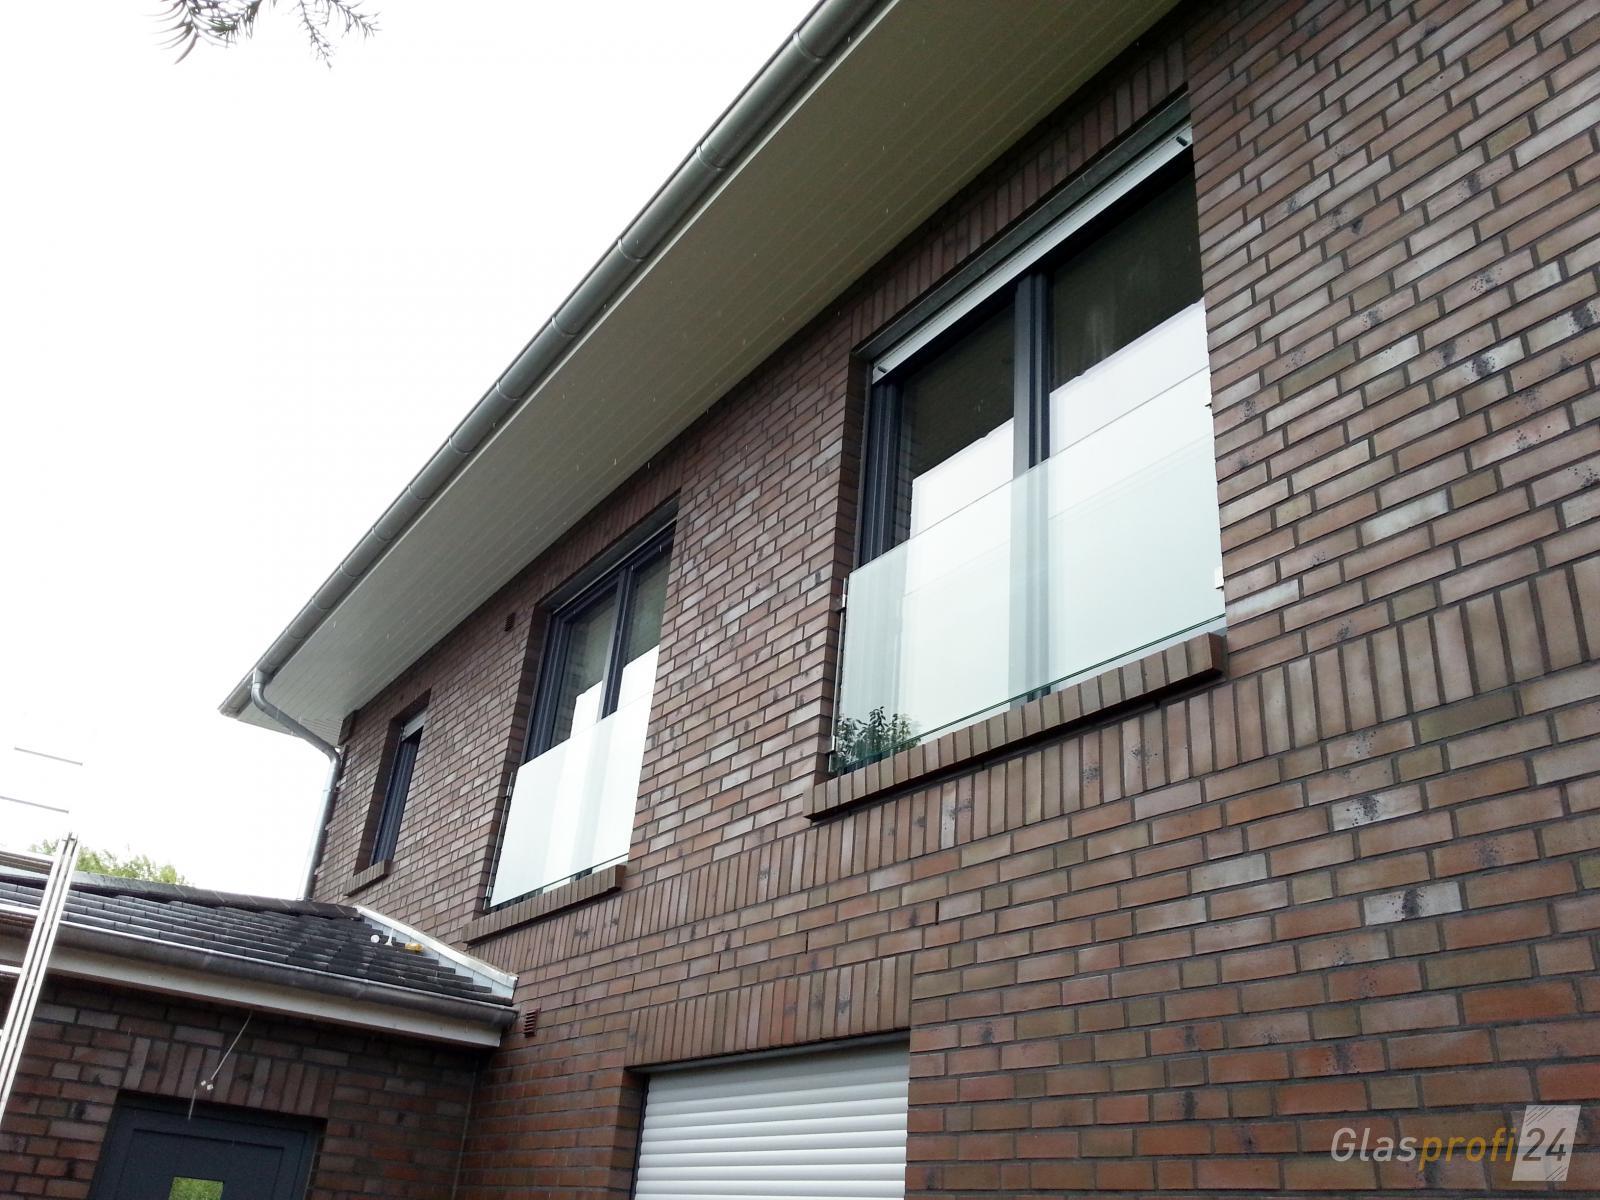 franz sischer balkon aus glas glasprofi24. Black Bedroom Furniture Sets. Home Design Ideas